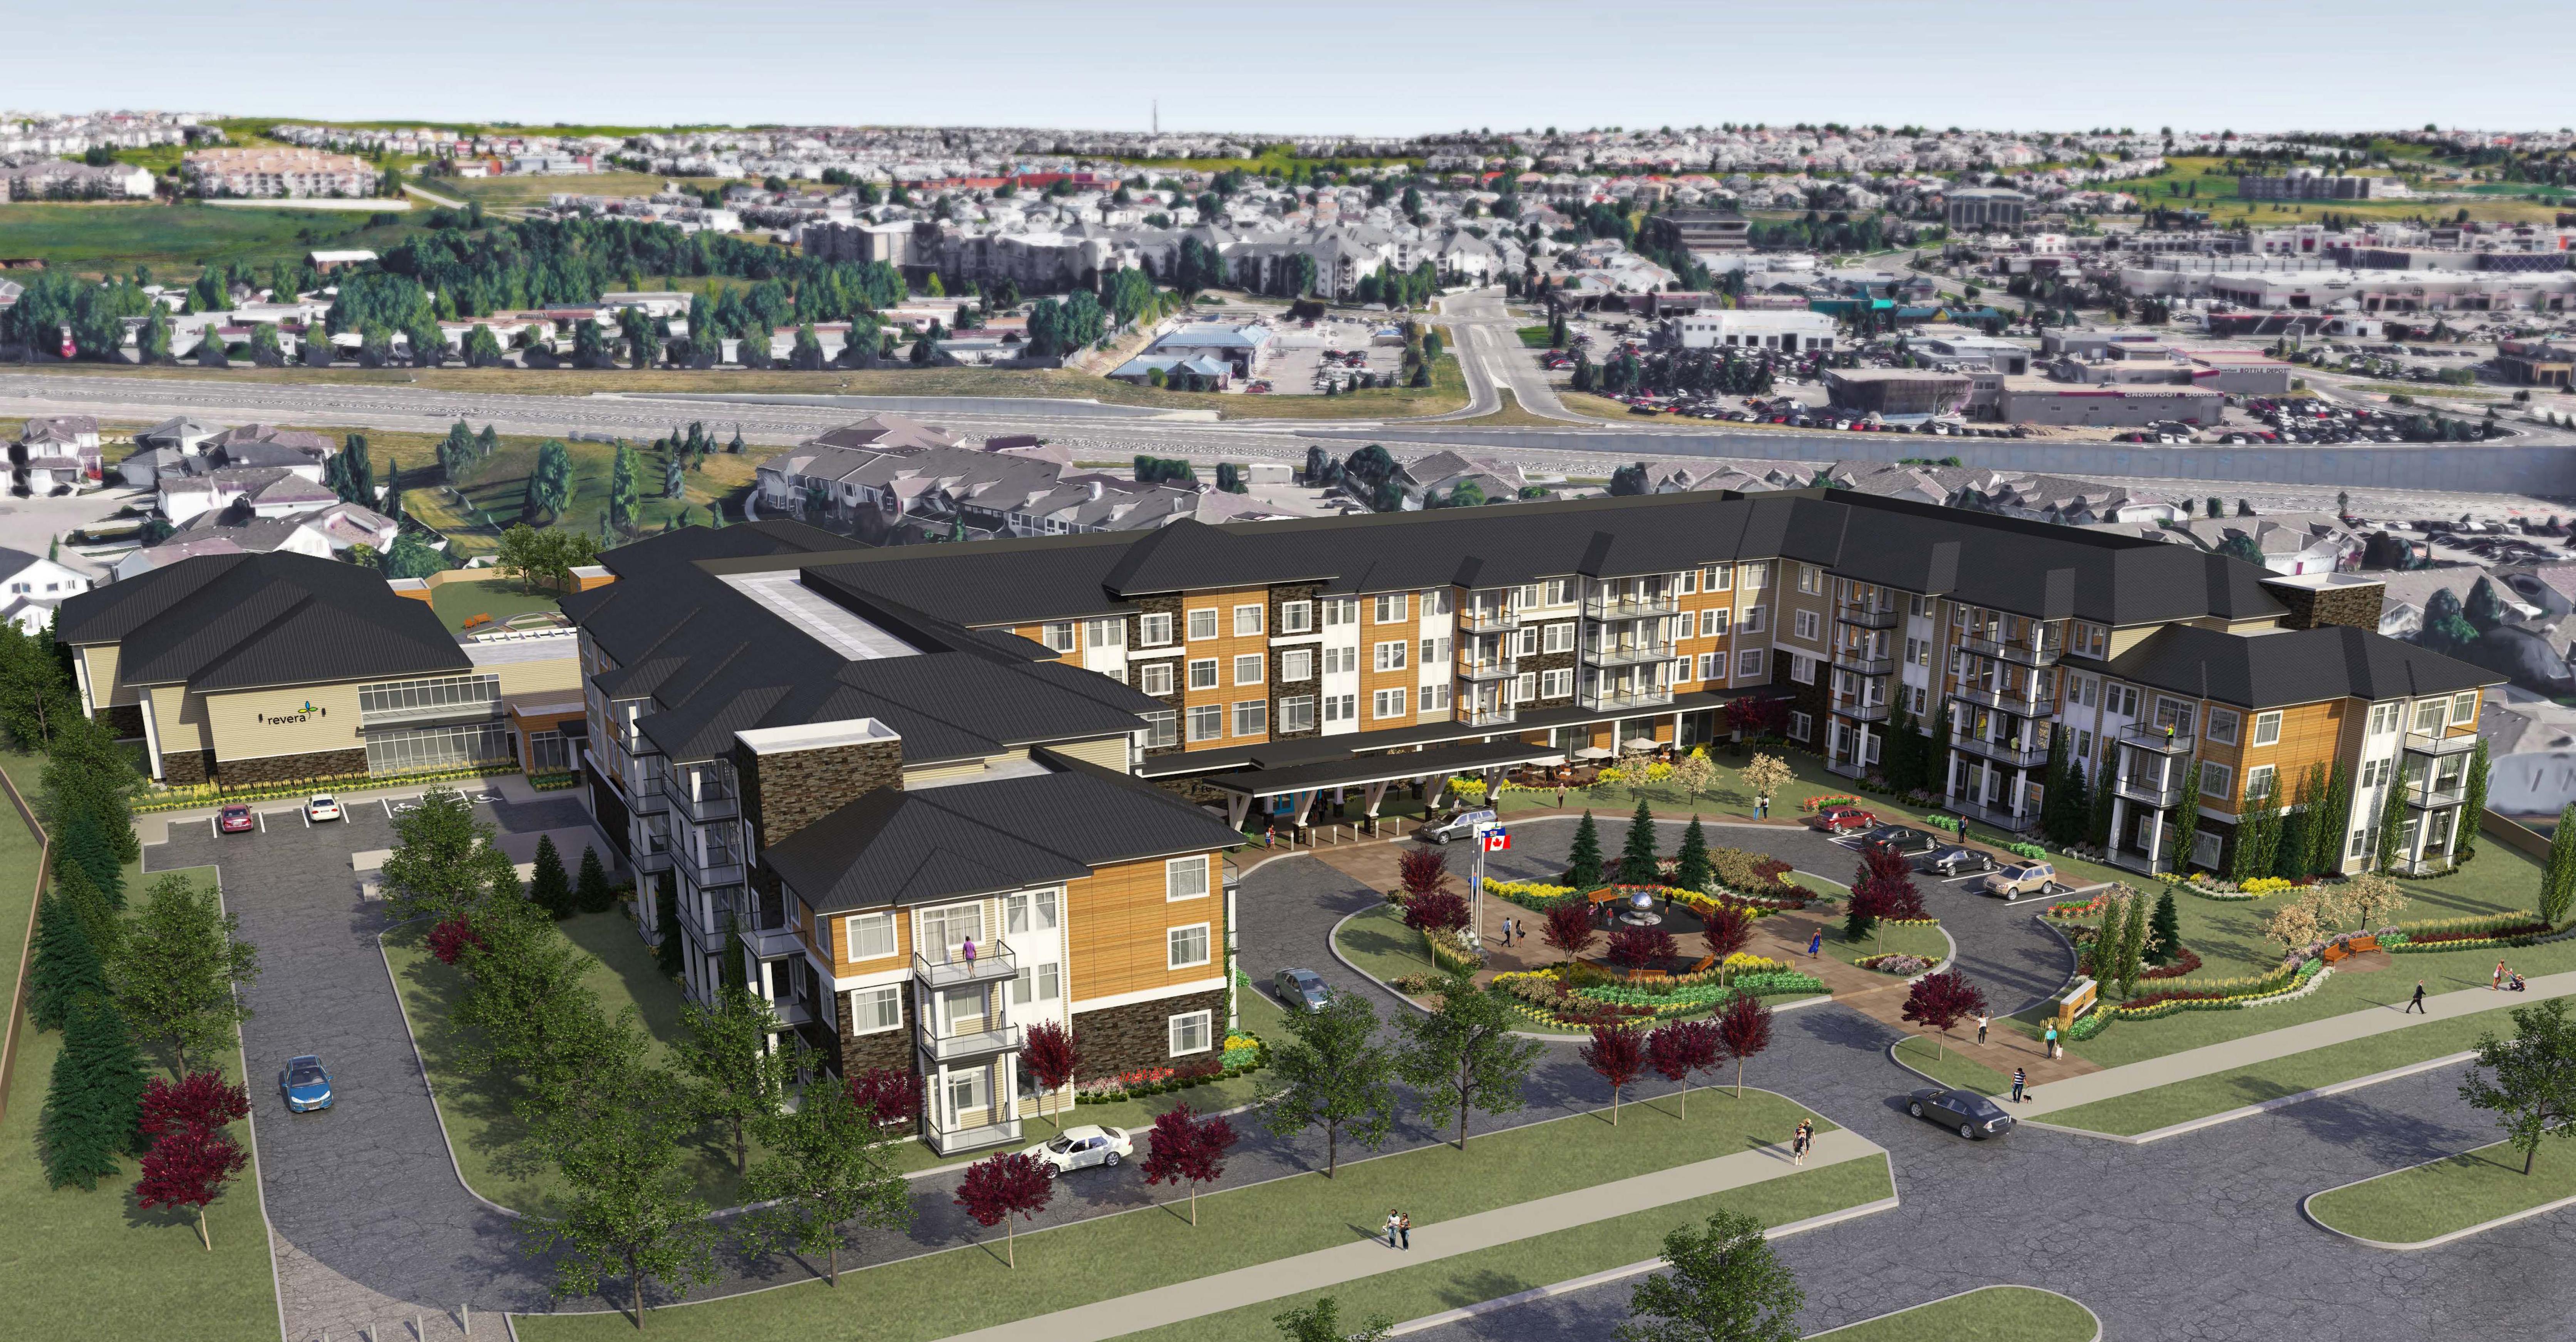 3D Rendering Planned Senior's Complex